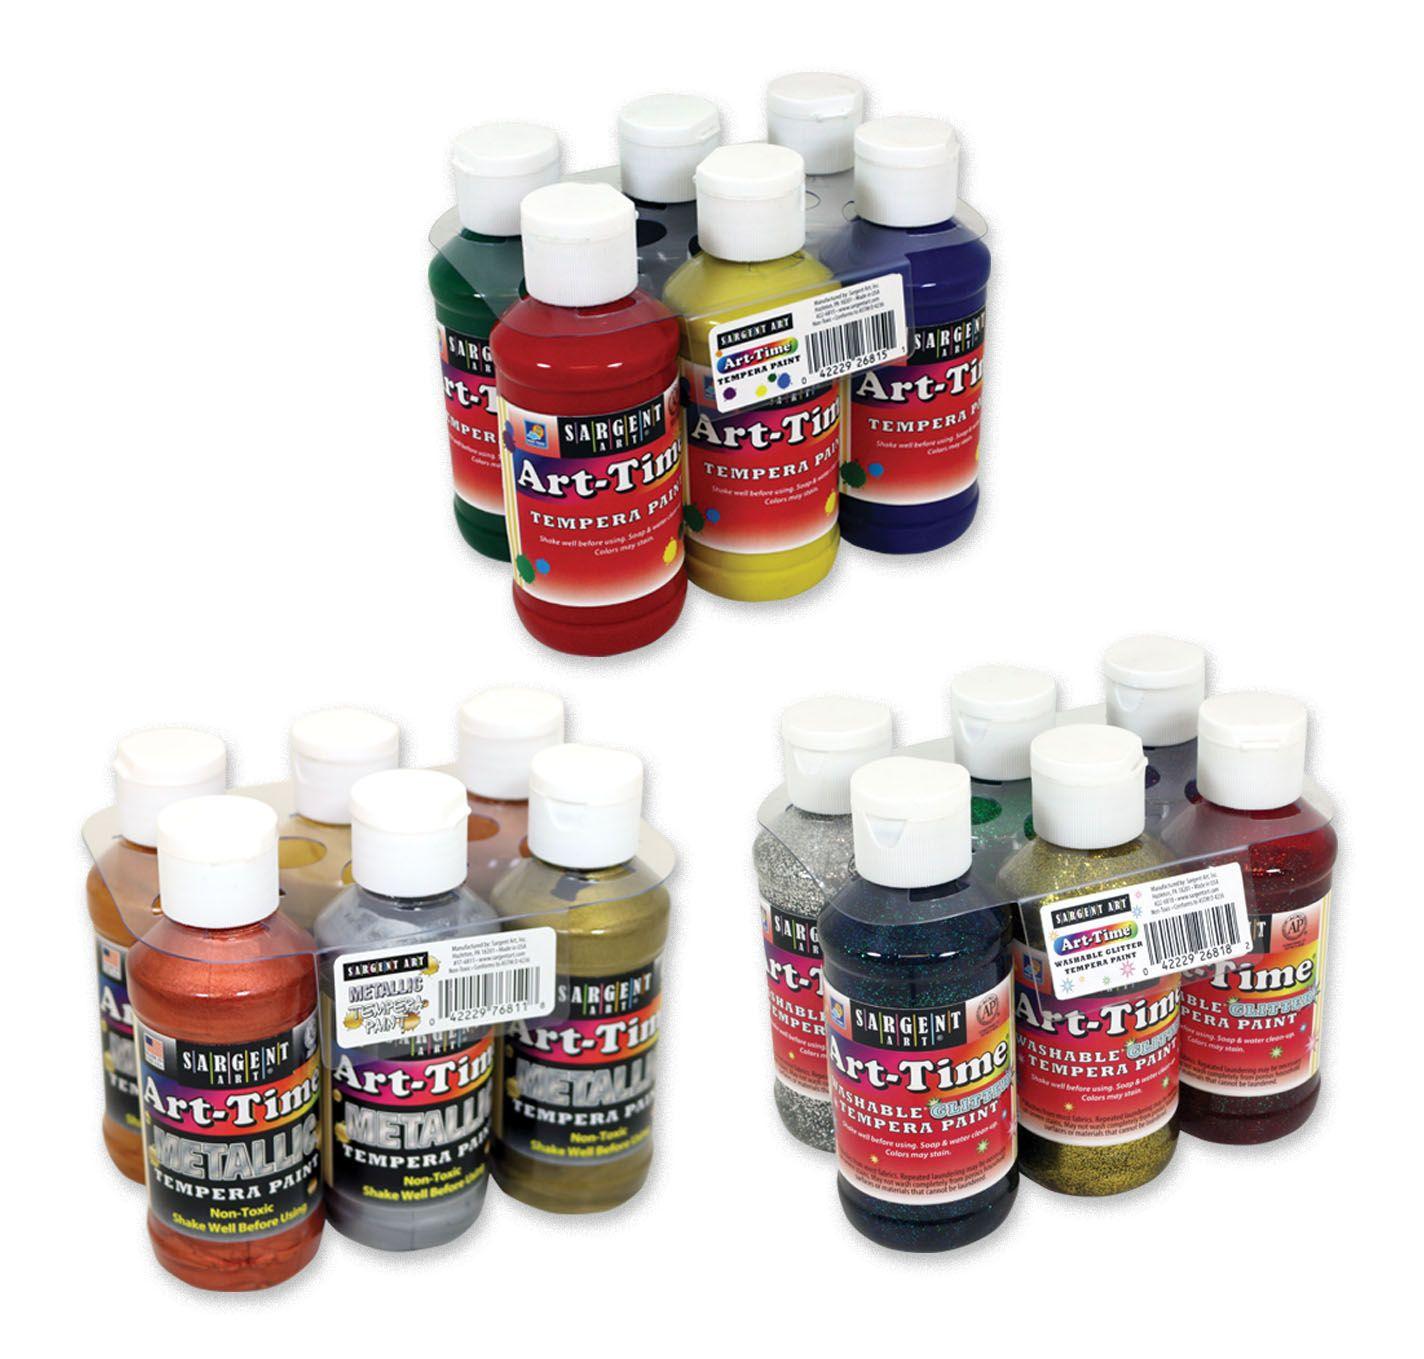 Is Sargent Art Tempera Paint Non Toxic